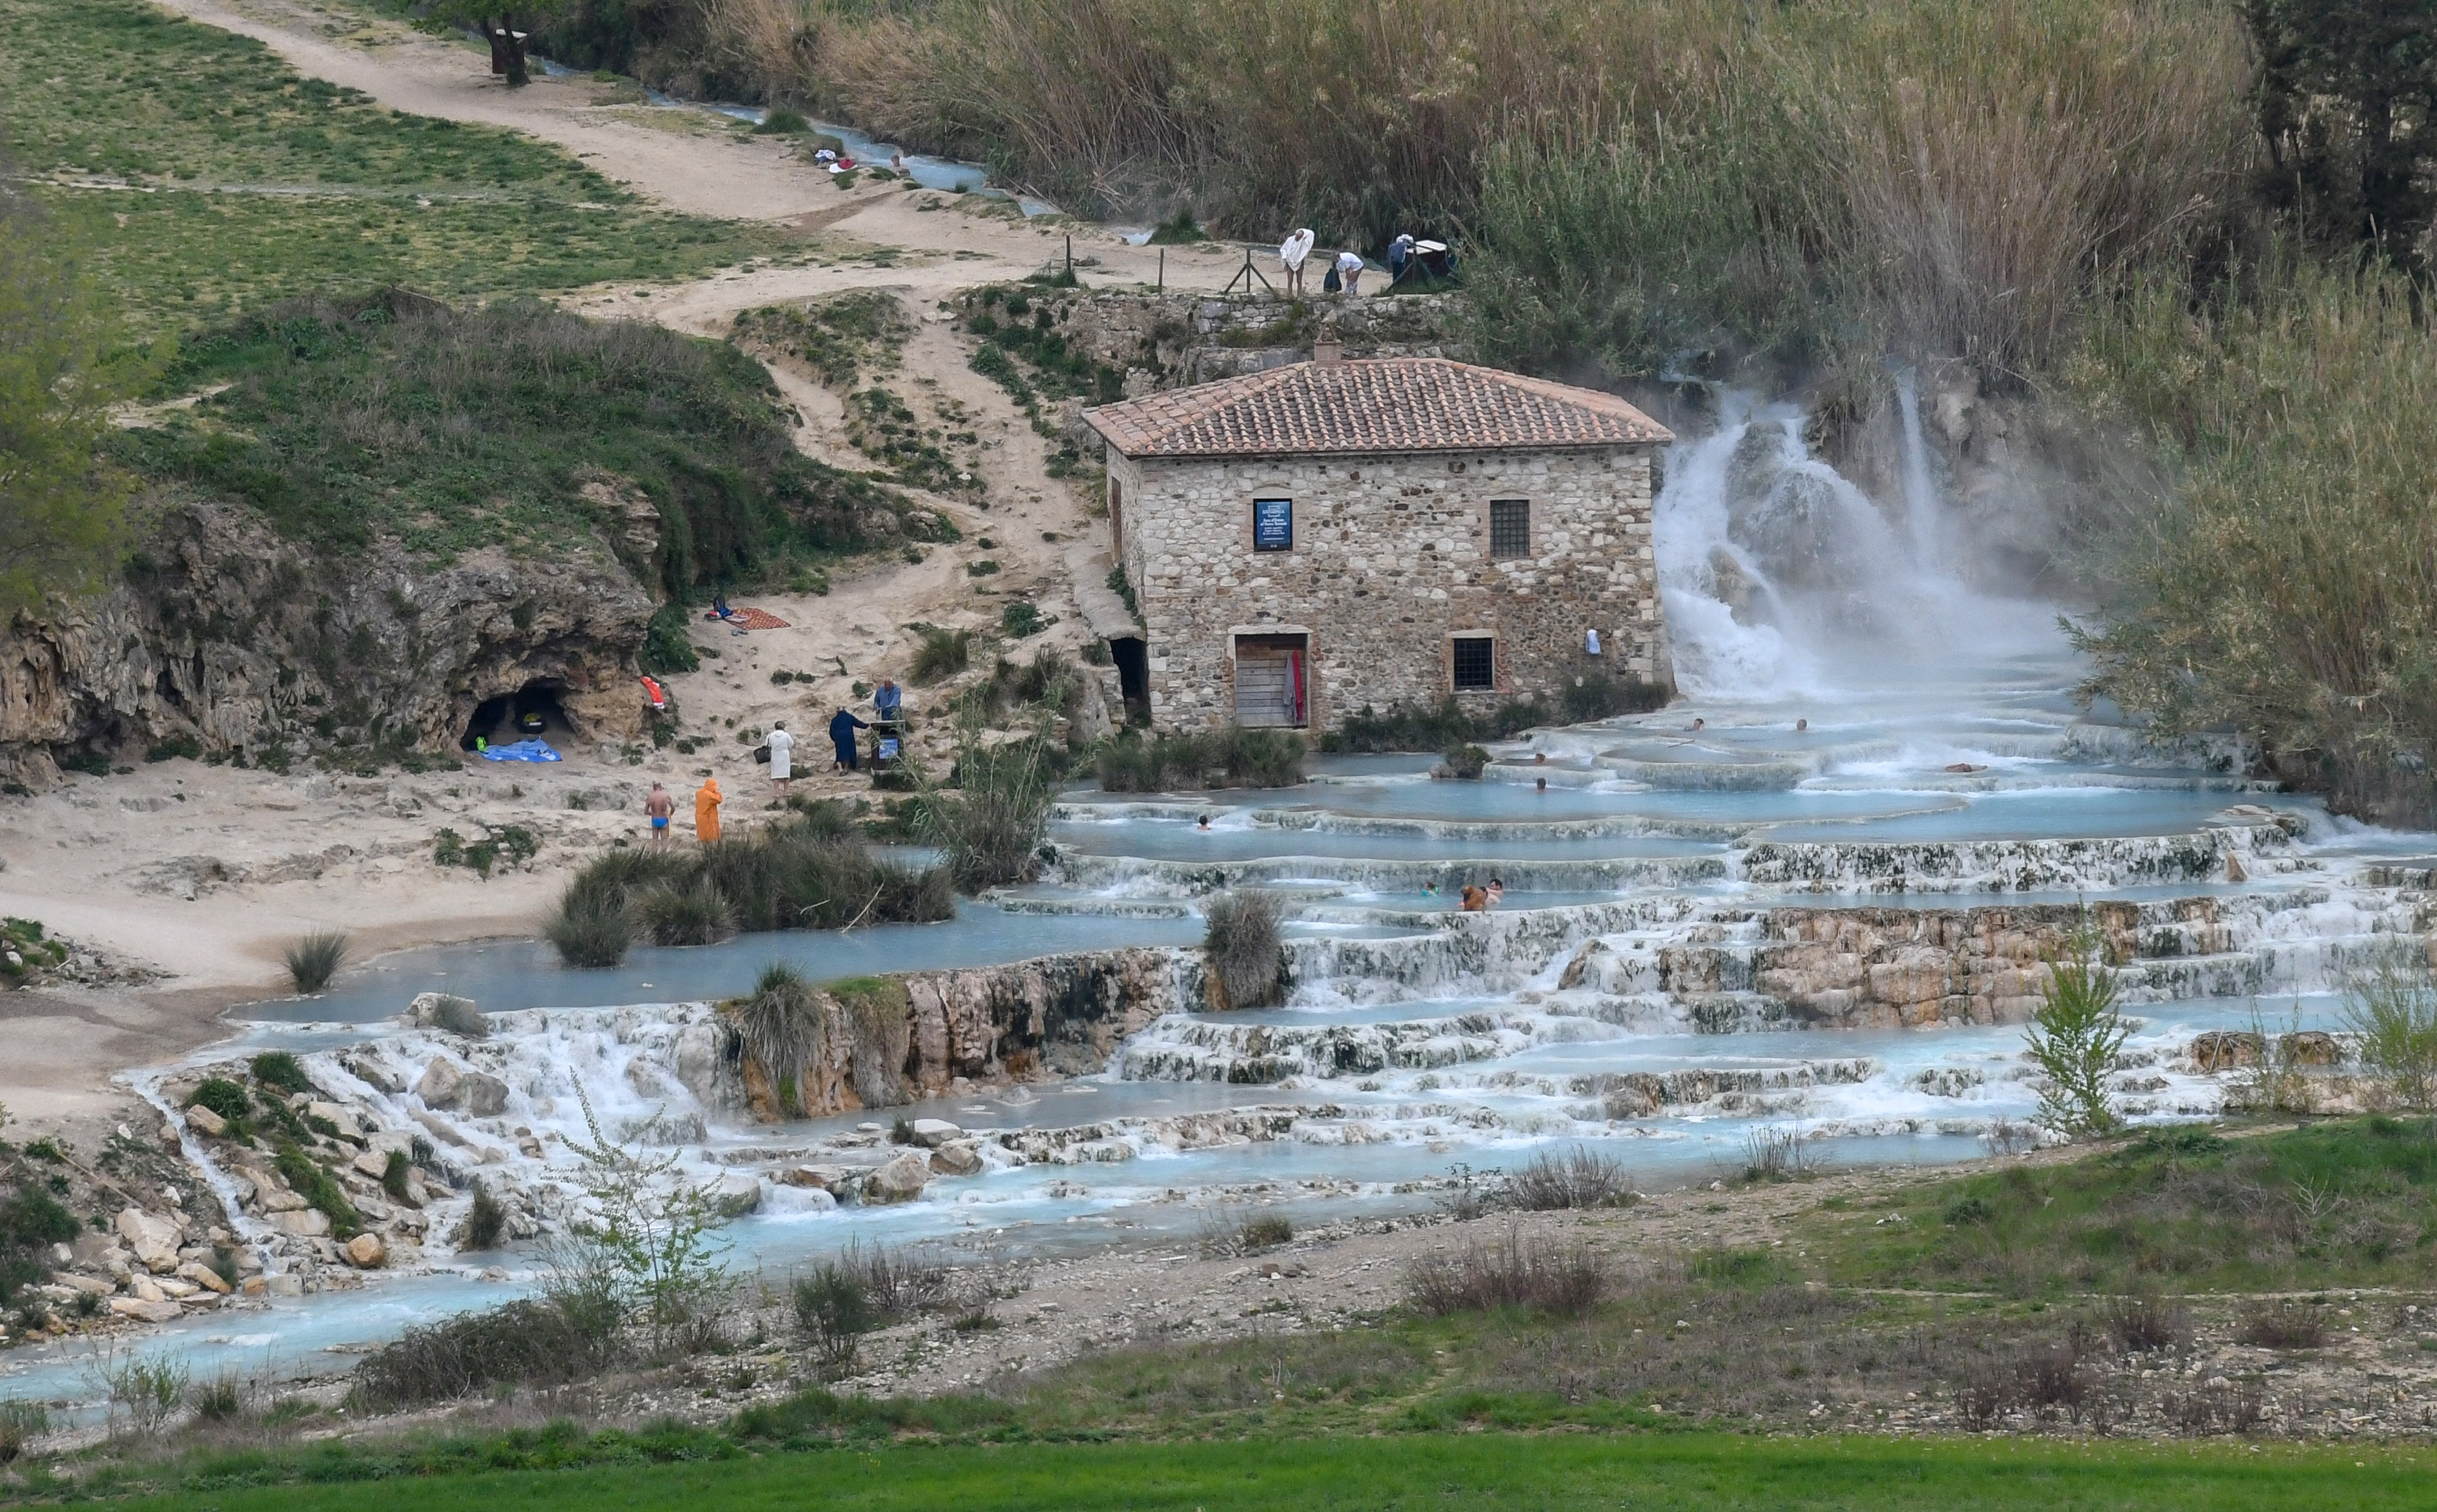 Hot springs in Saturnia, Tuscany, Italy, Honeymoon in Italy Travel Guide